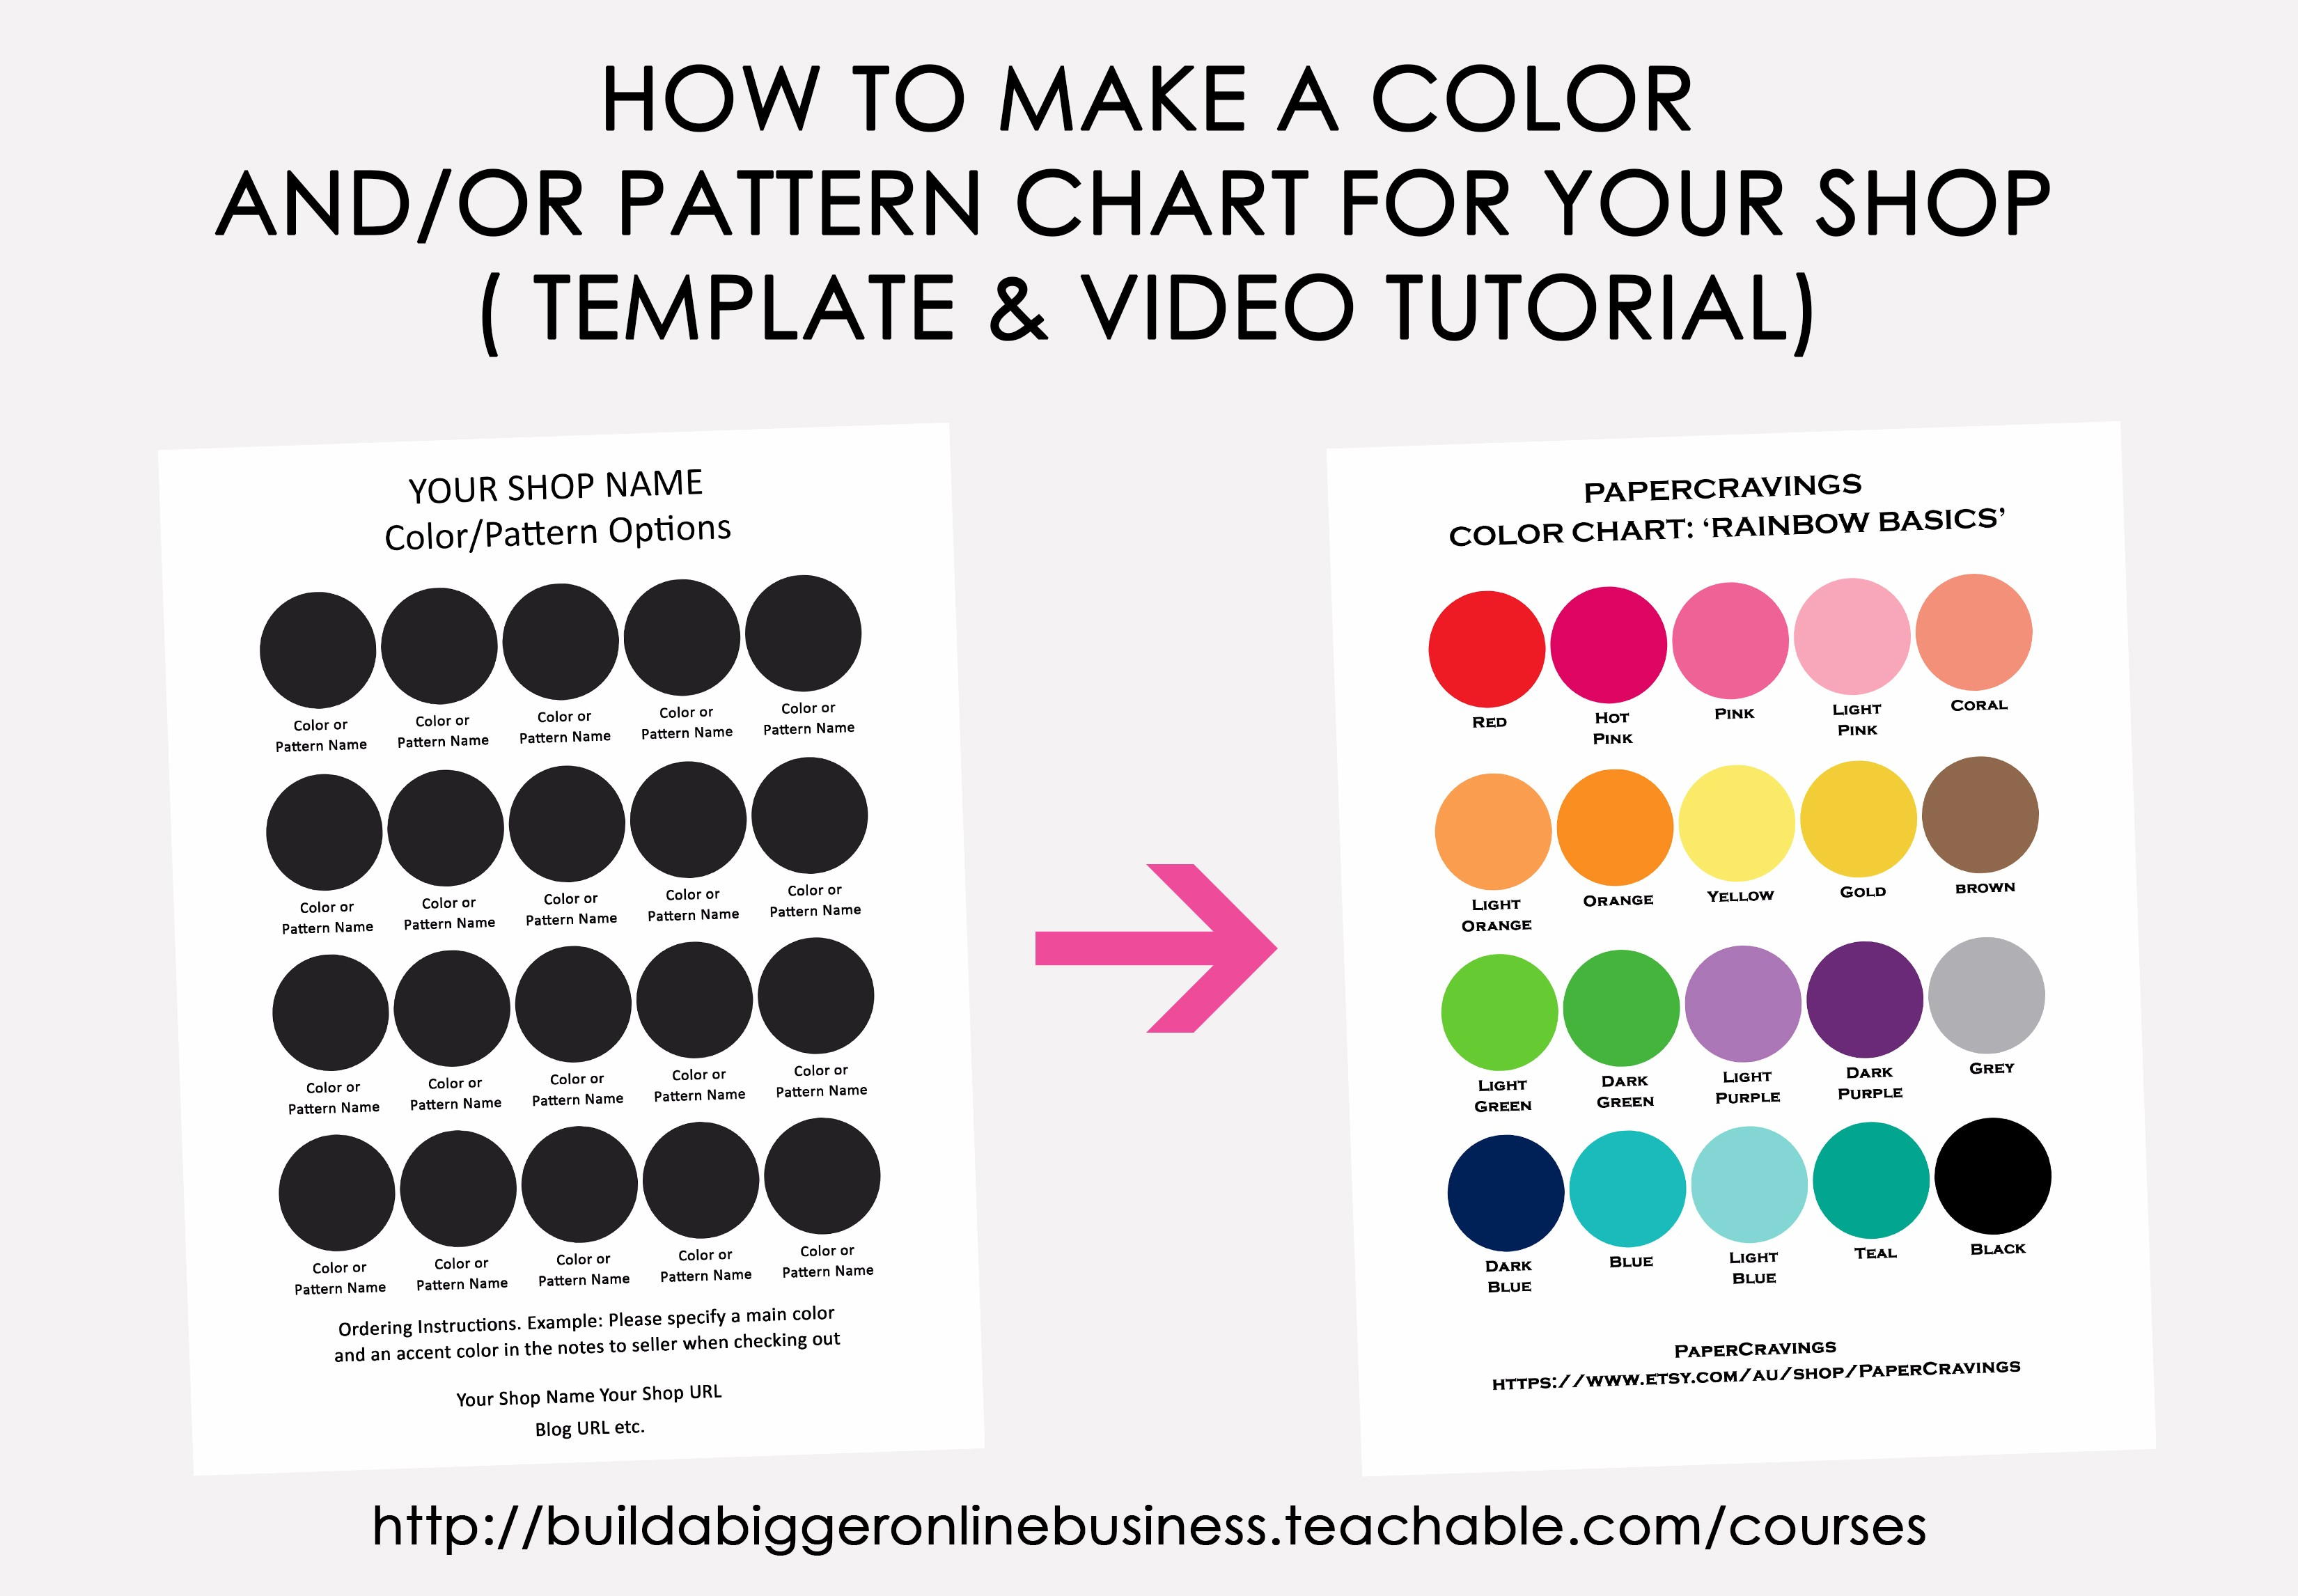 how to make a color chart in photoshop build a bigger online. Black Bedroom Furniture Sets. Home Design Ideas